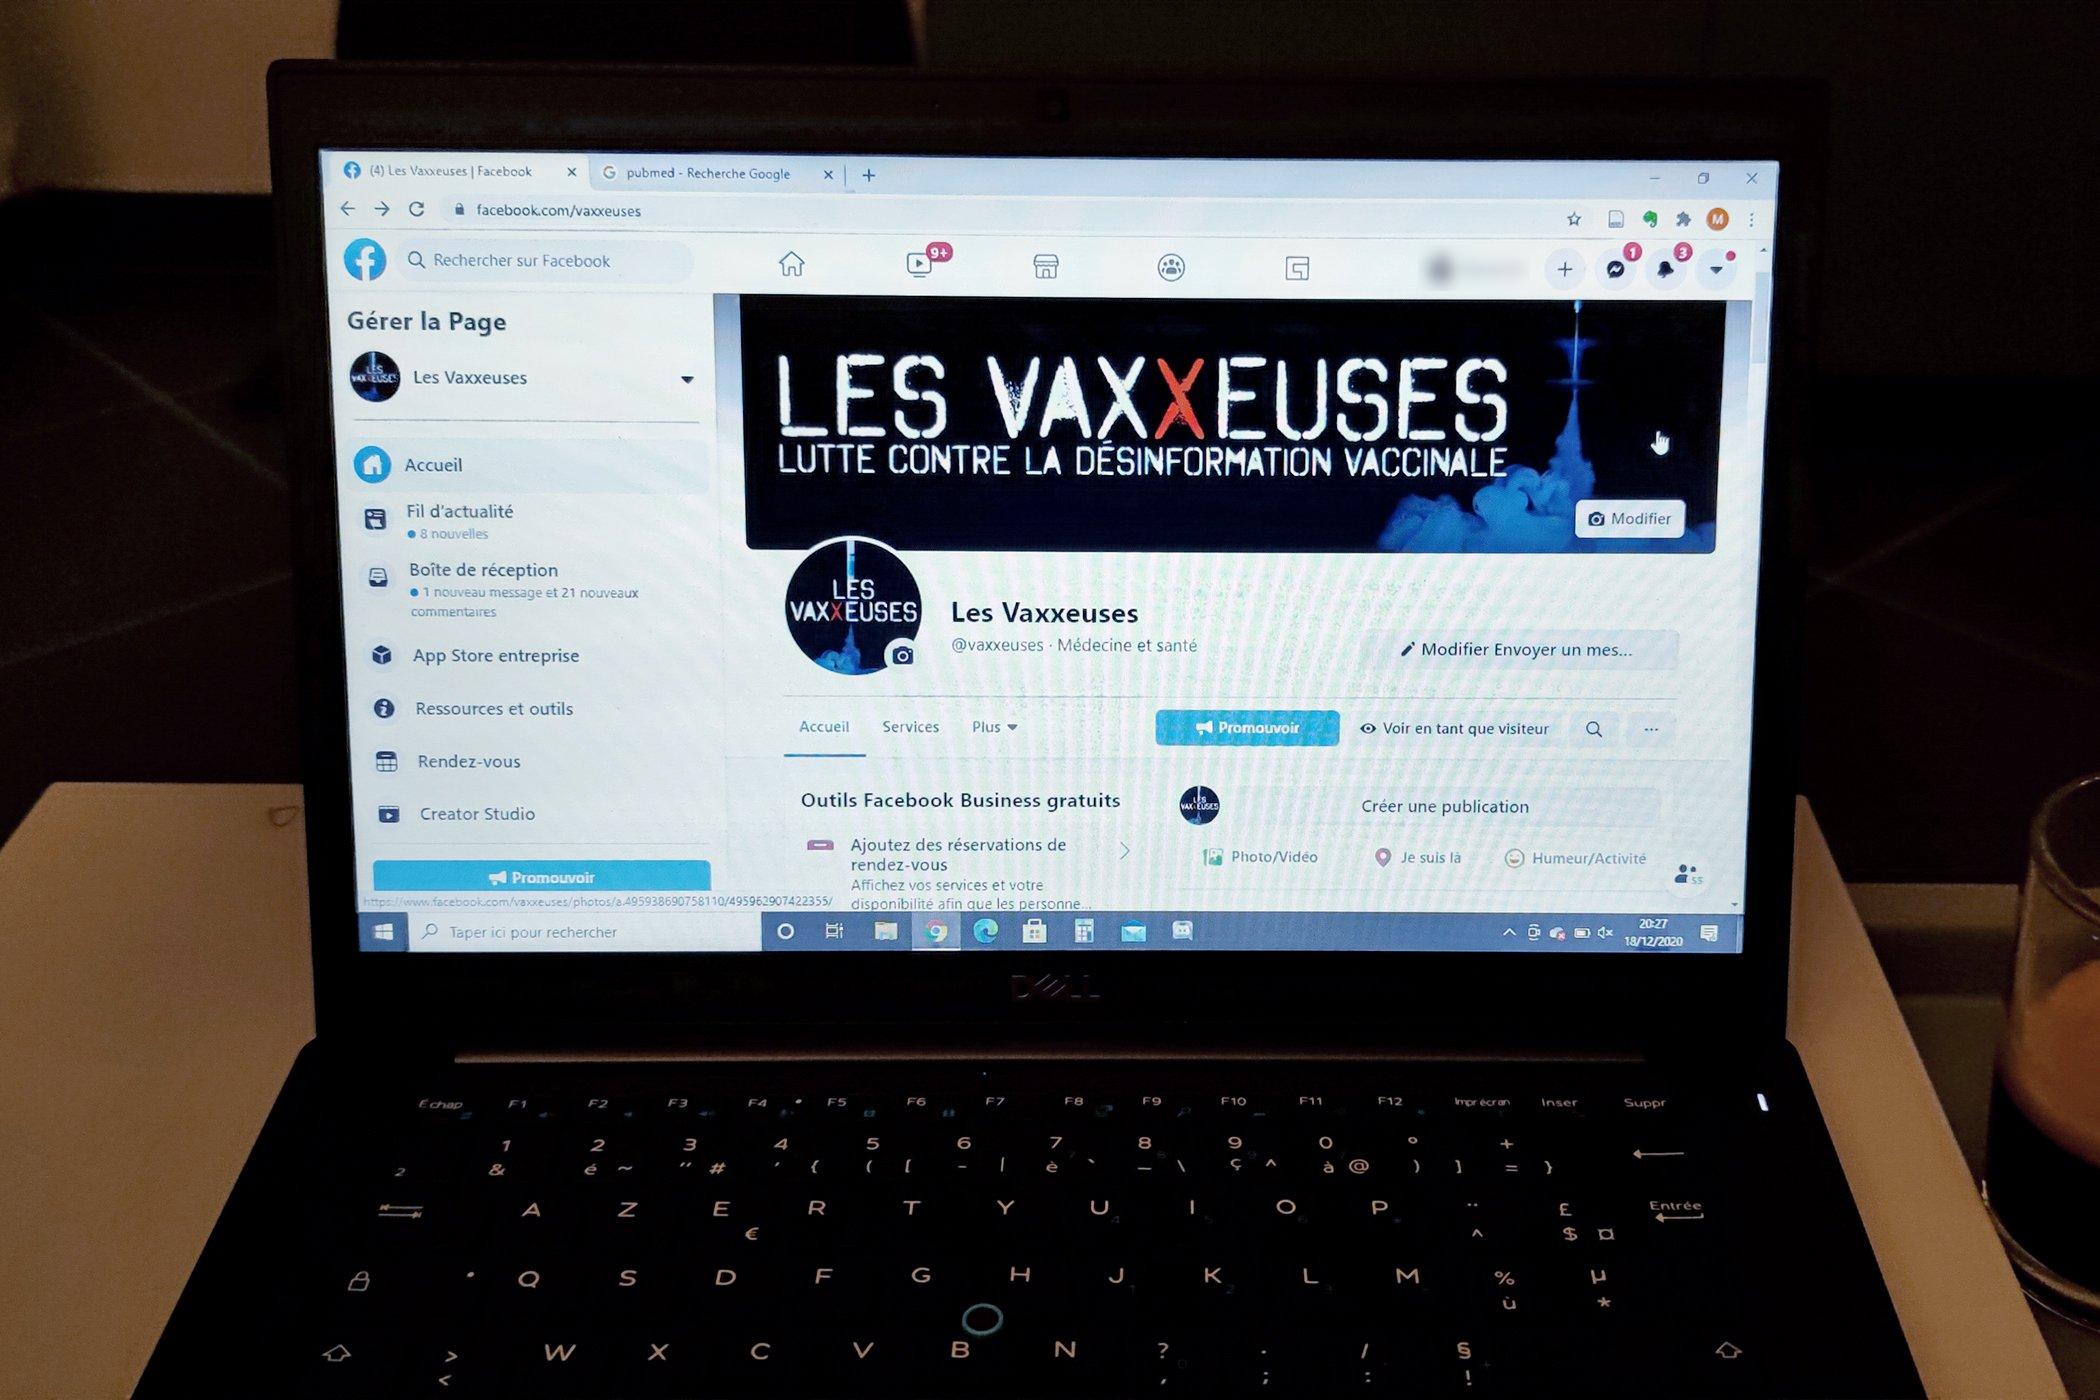 Les Vaxxeuses.png